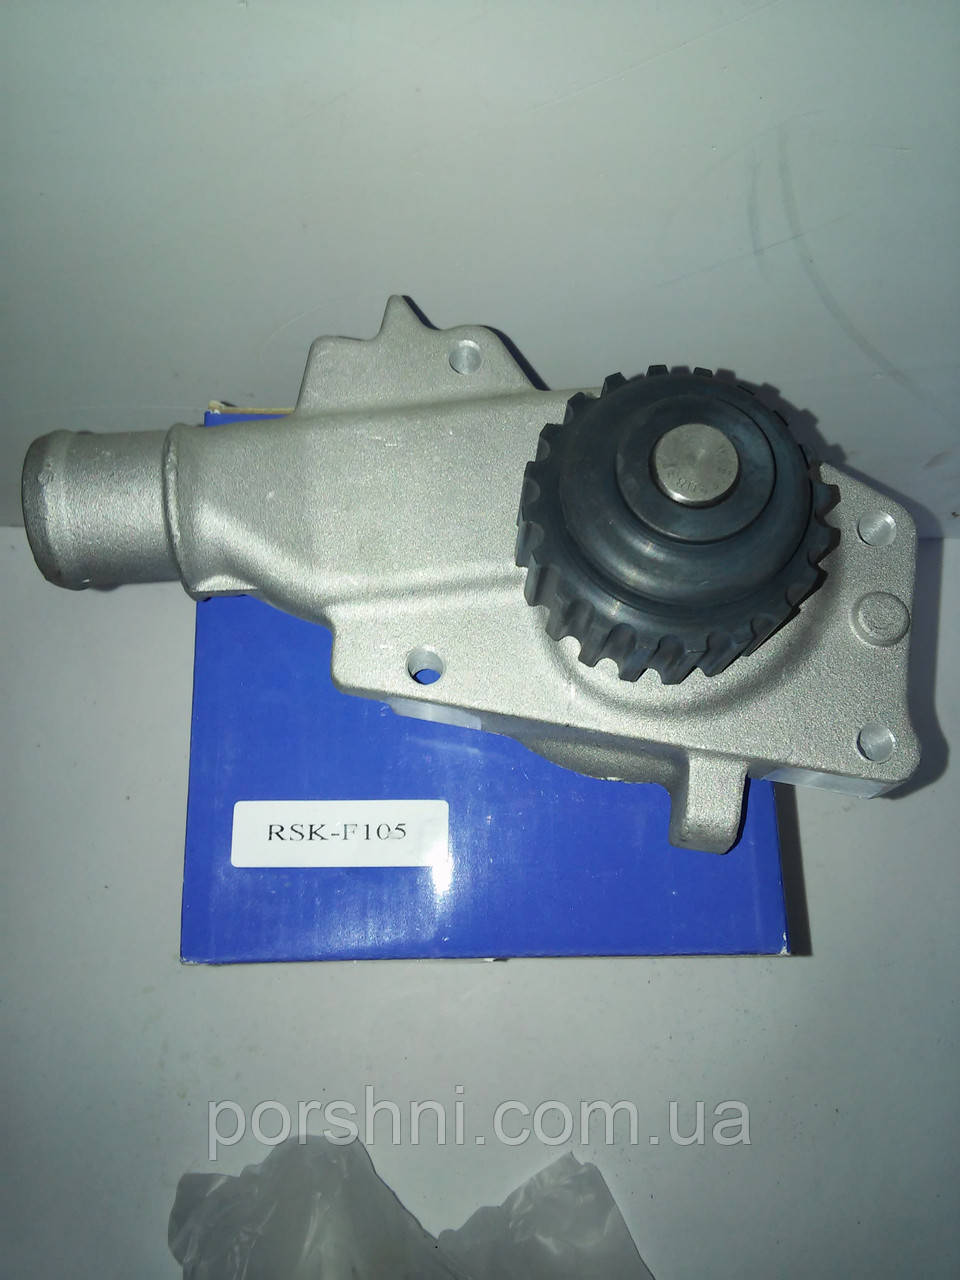 Водяной насос Ford  Escort   1.4 - 1.6 CVH  86 -- RSK F105